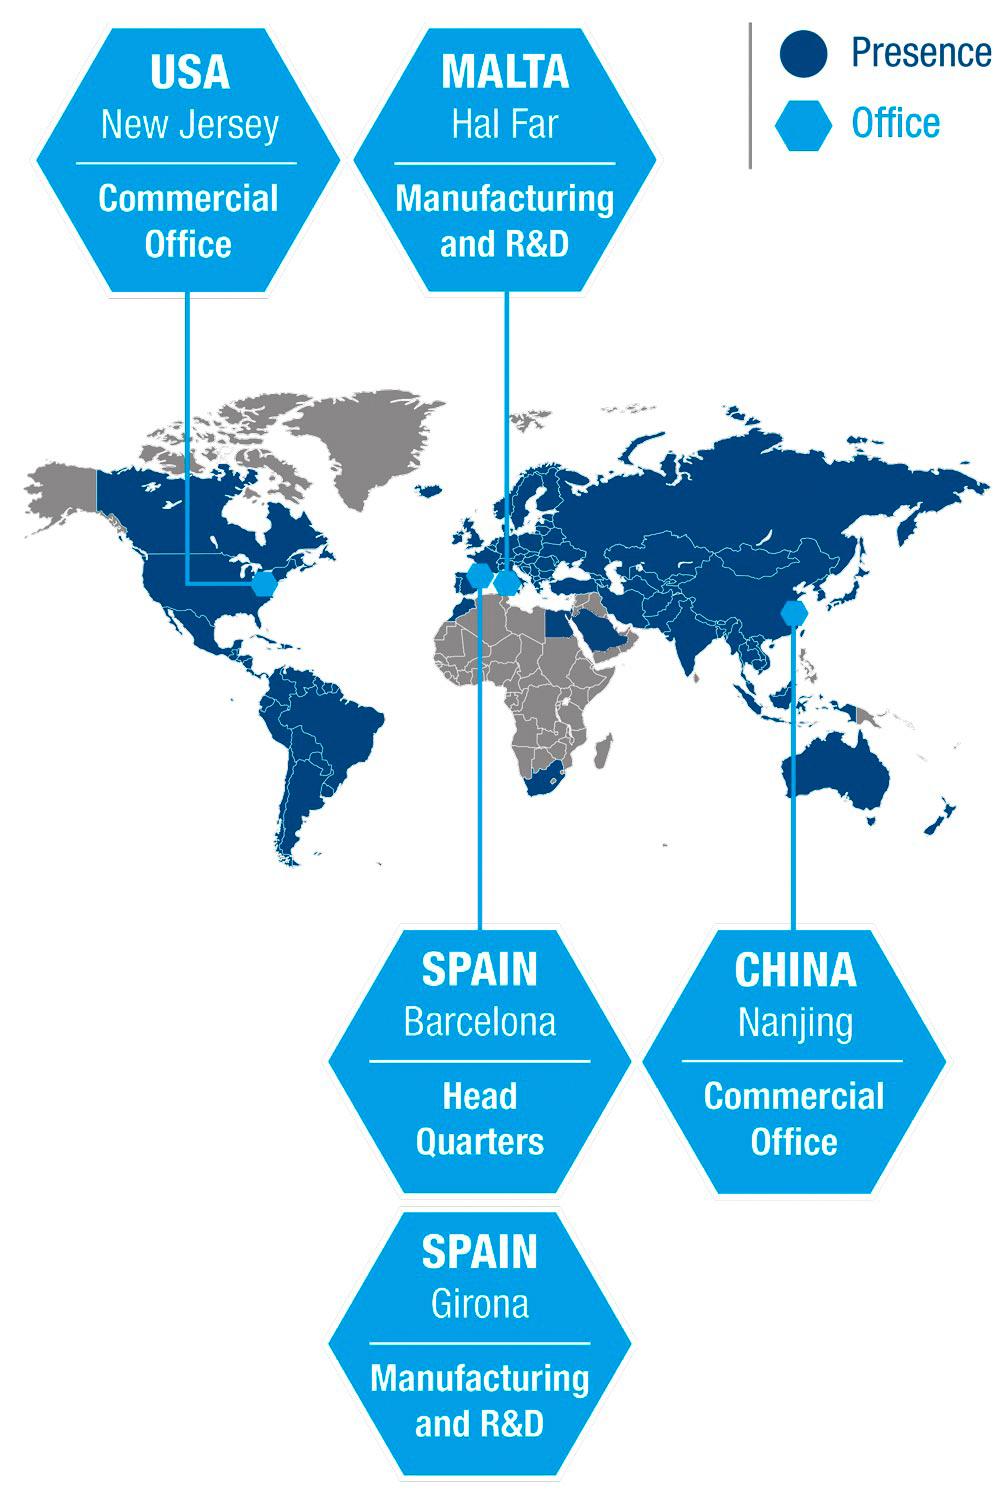 Medichem Worldwide Presence